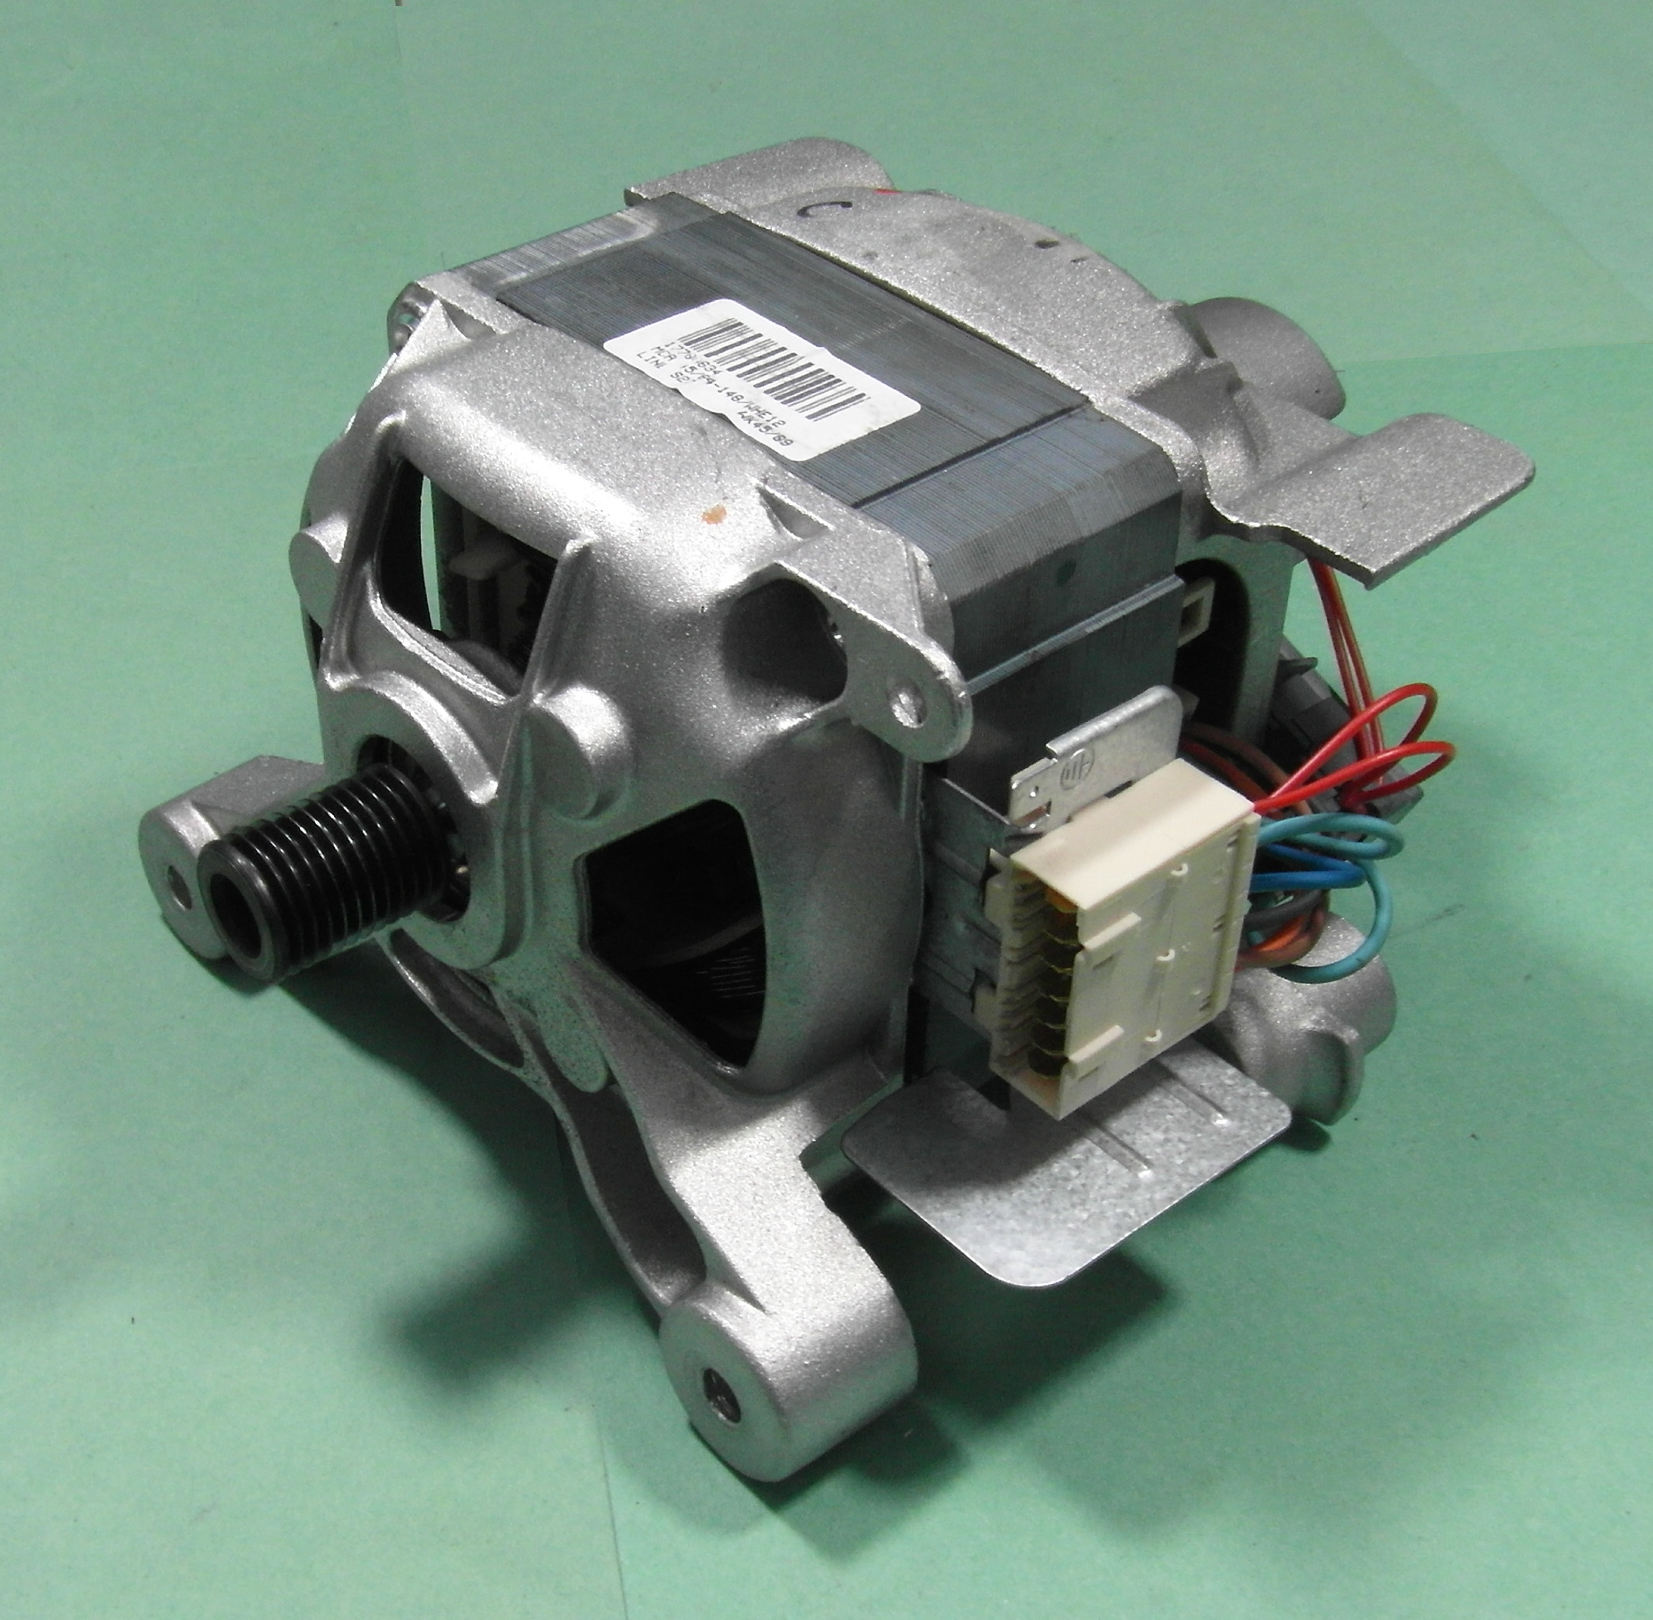 Whirlpool Awod5526 Washing Machine Motor Mca 45 64